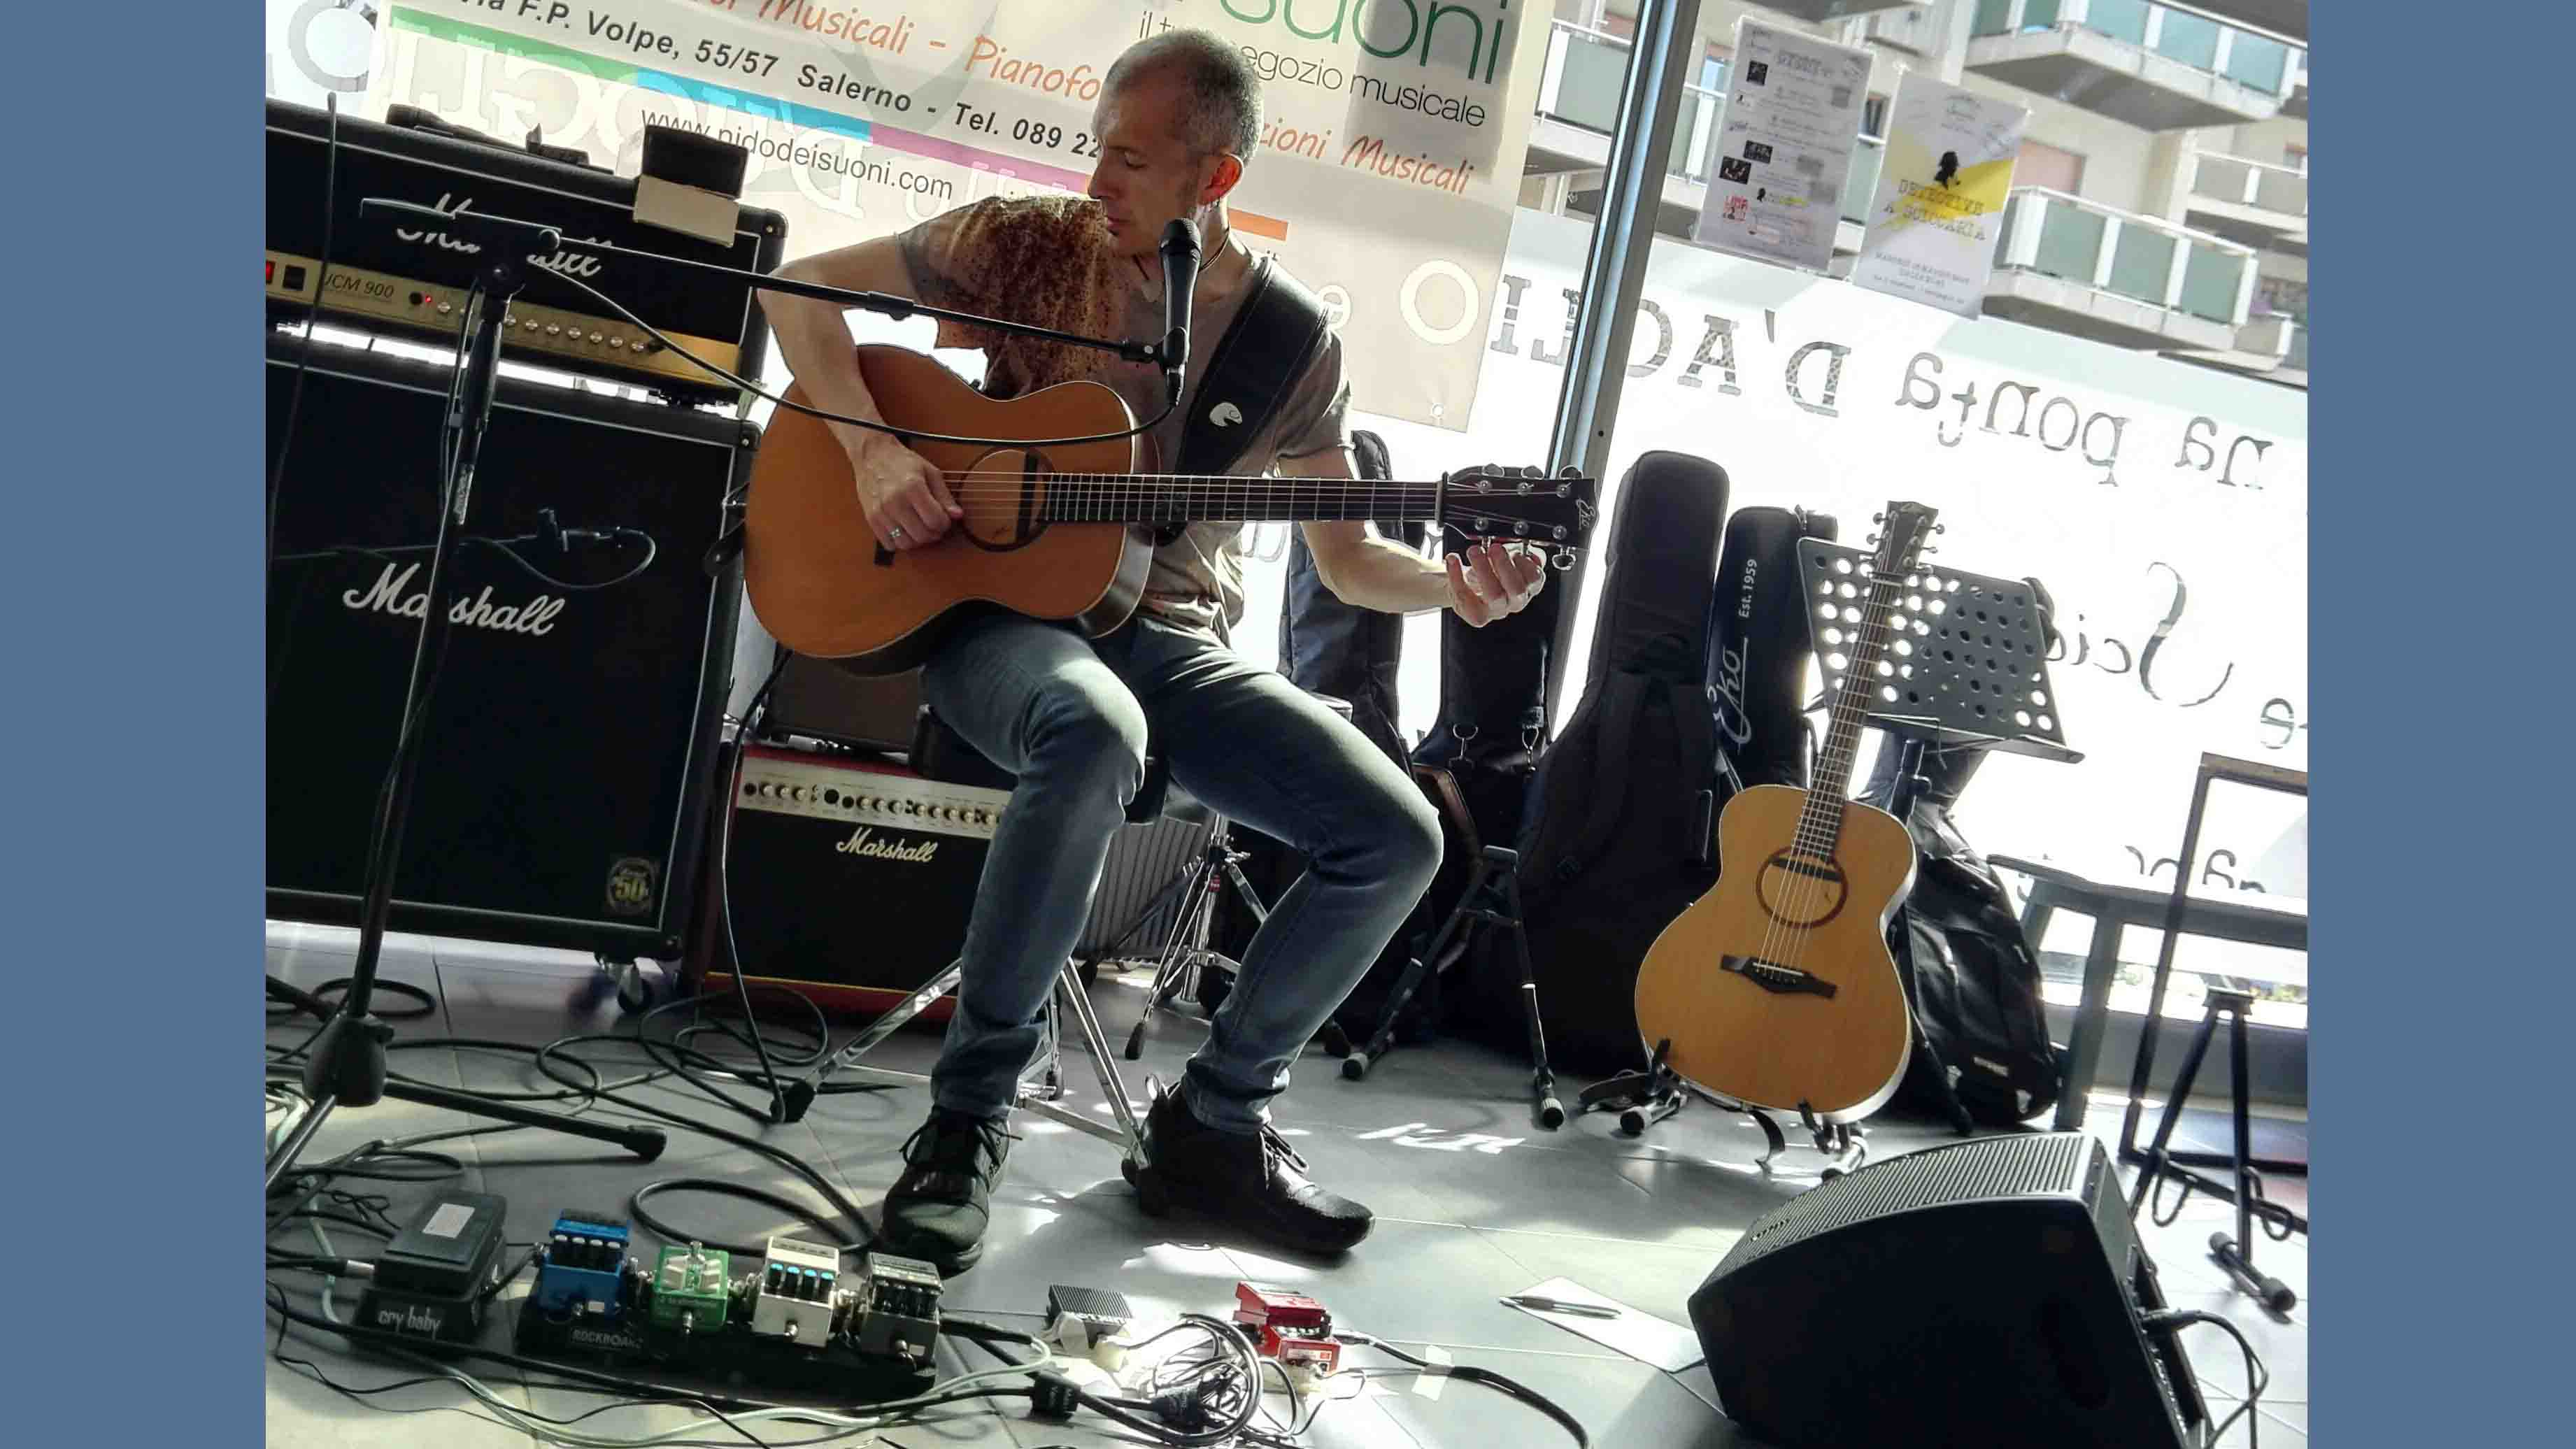 Setup Massimo Varini - Reportage Masterclass di chitarra con Massimo Varini